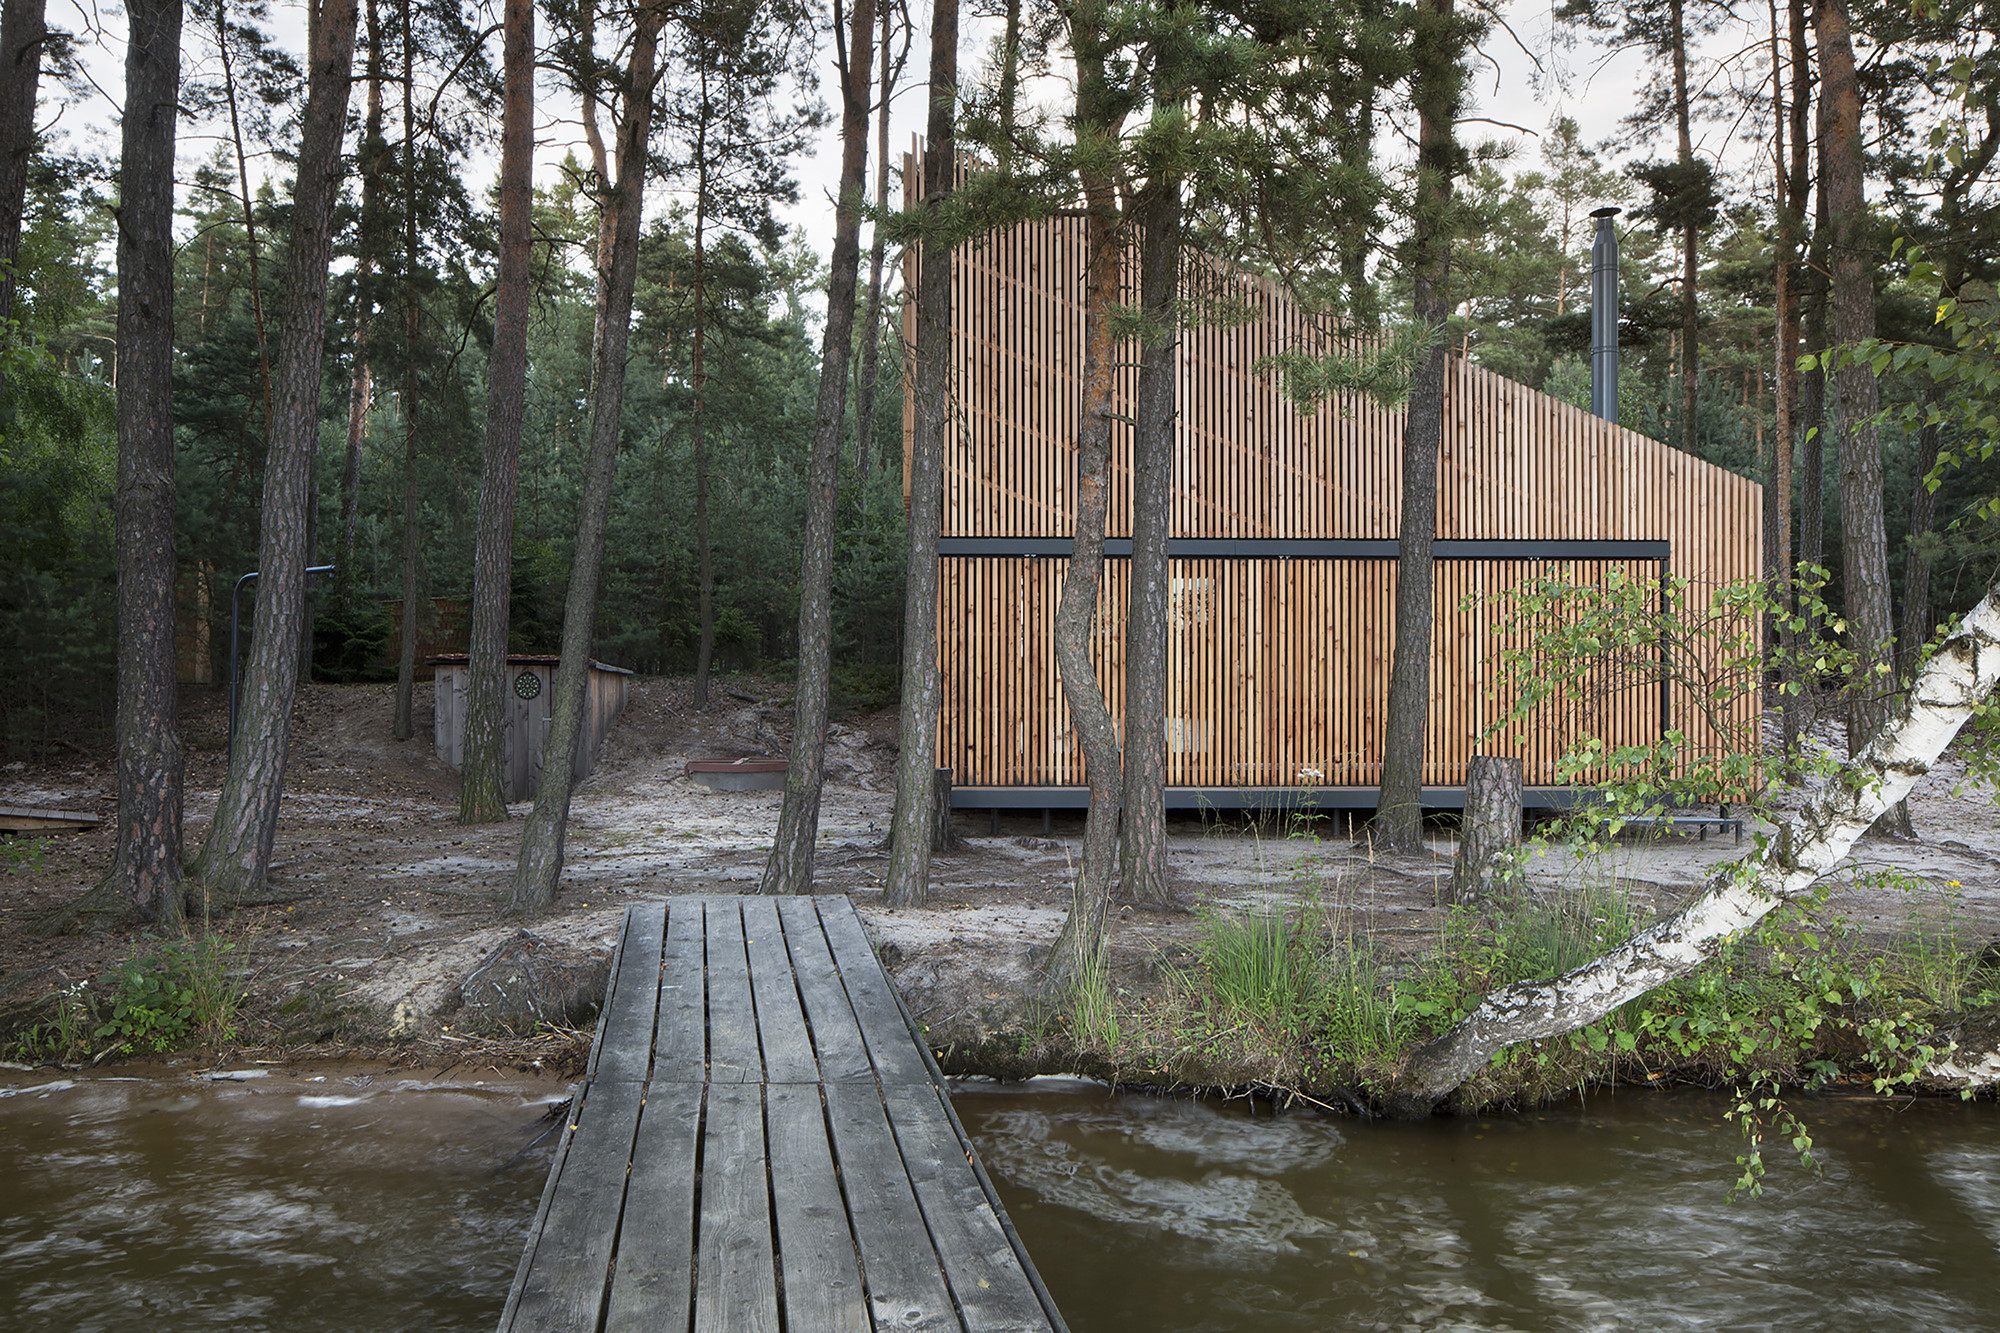 Lake Cabin / FAM Architekti + Feilden+Mawson, © Tomas Balej